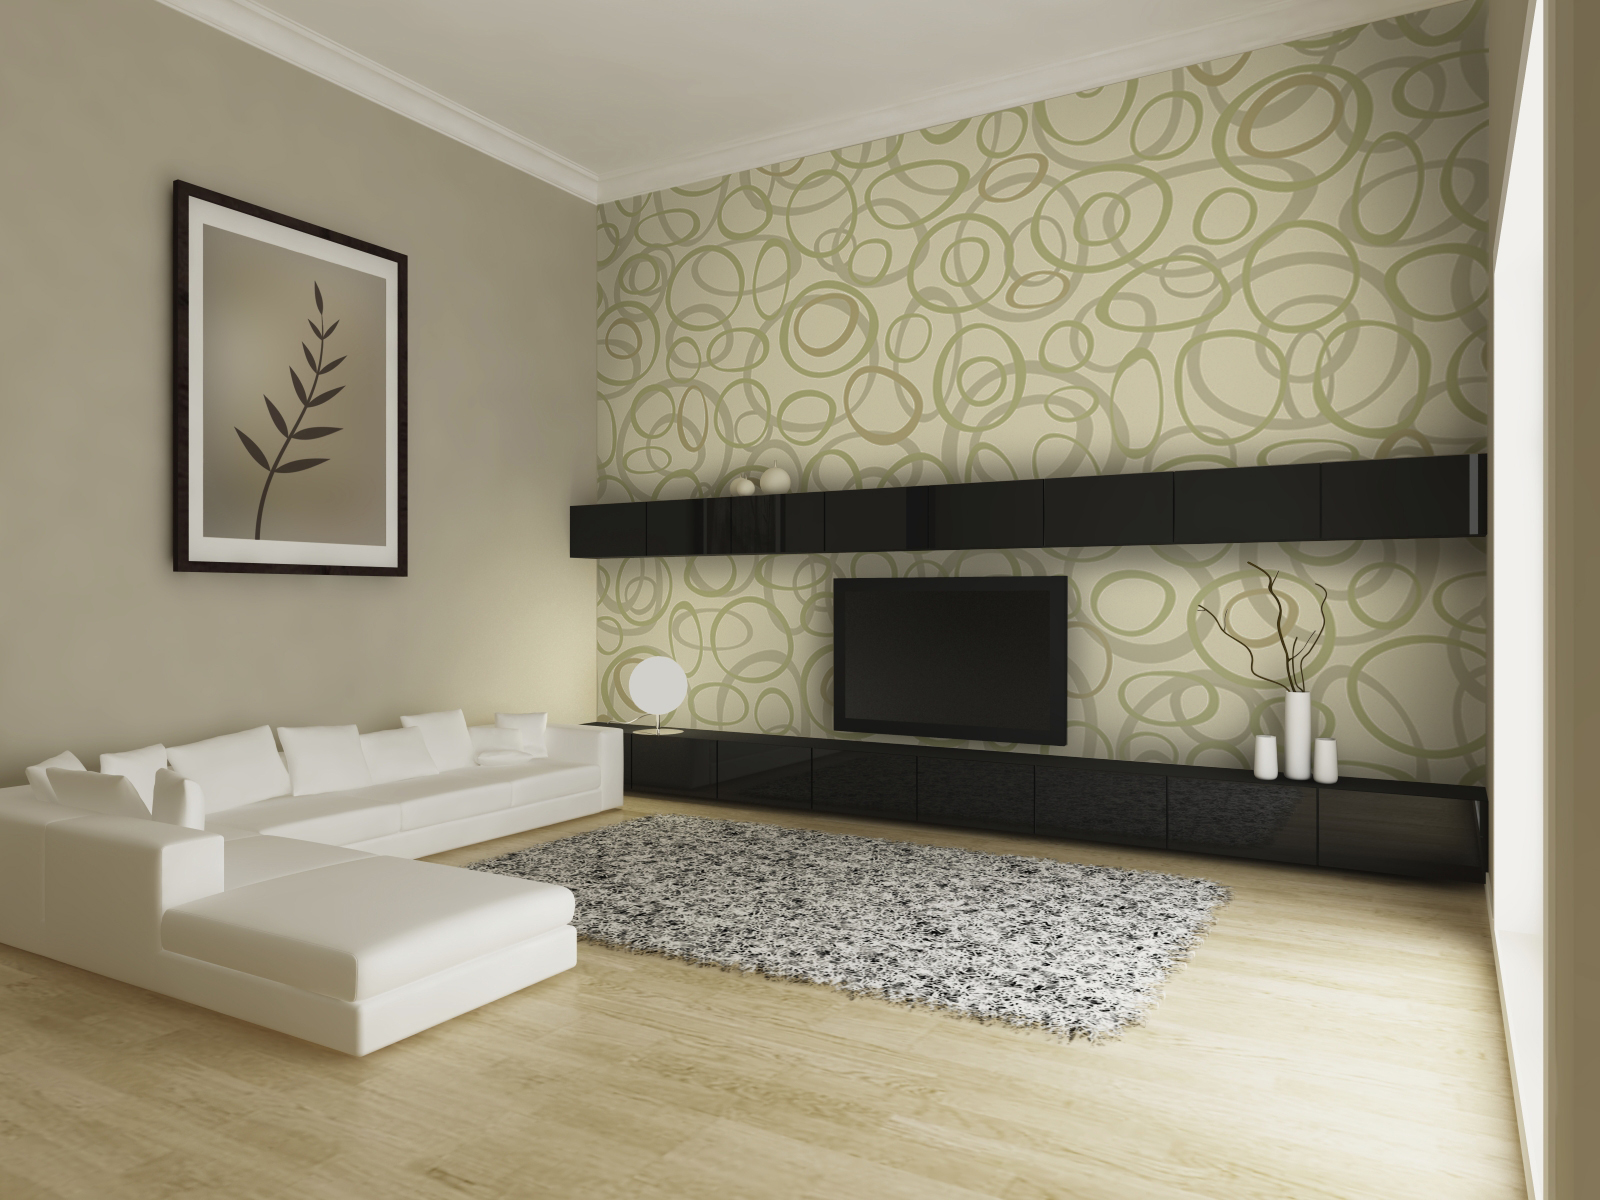 wallpaper interior design 1600x1200